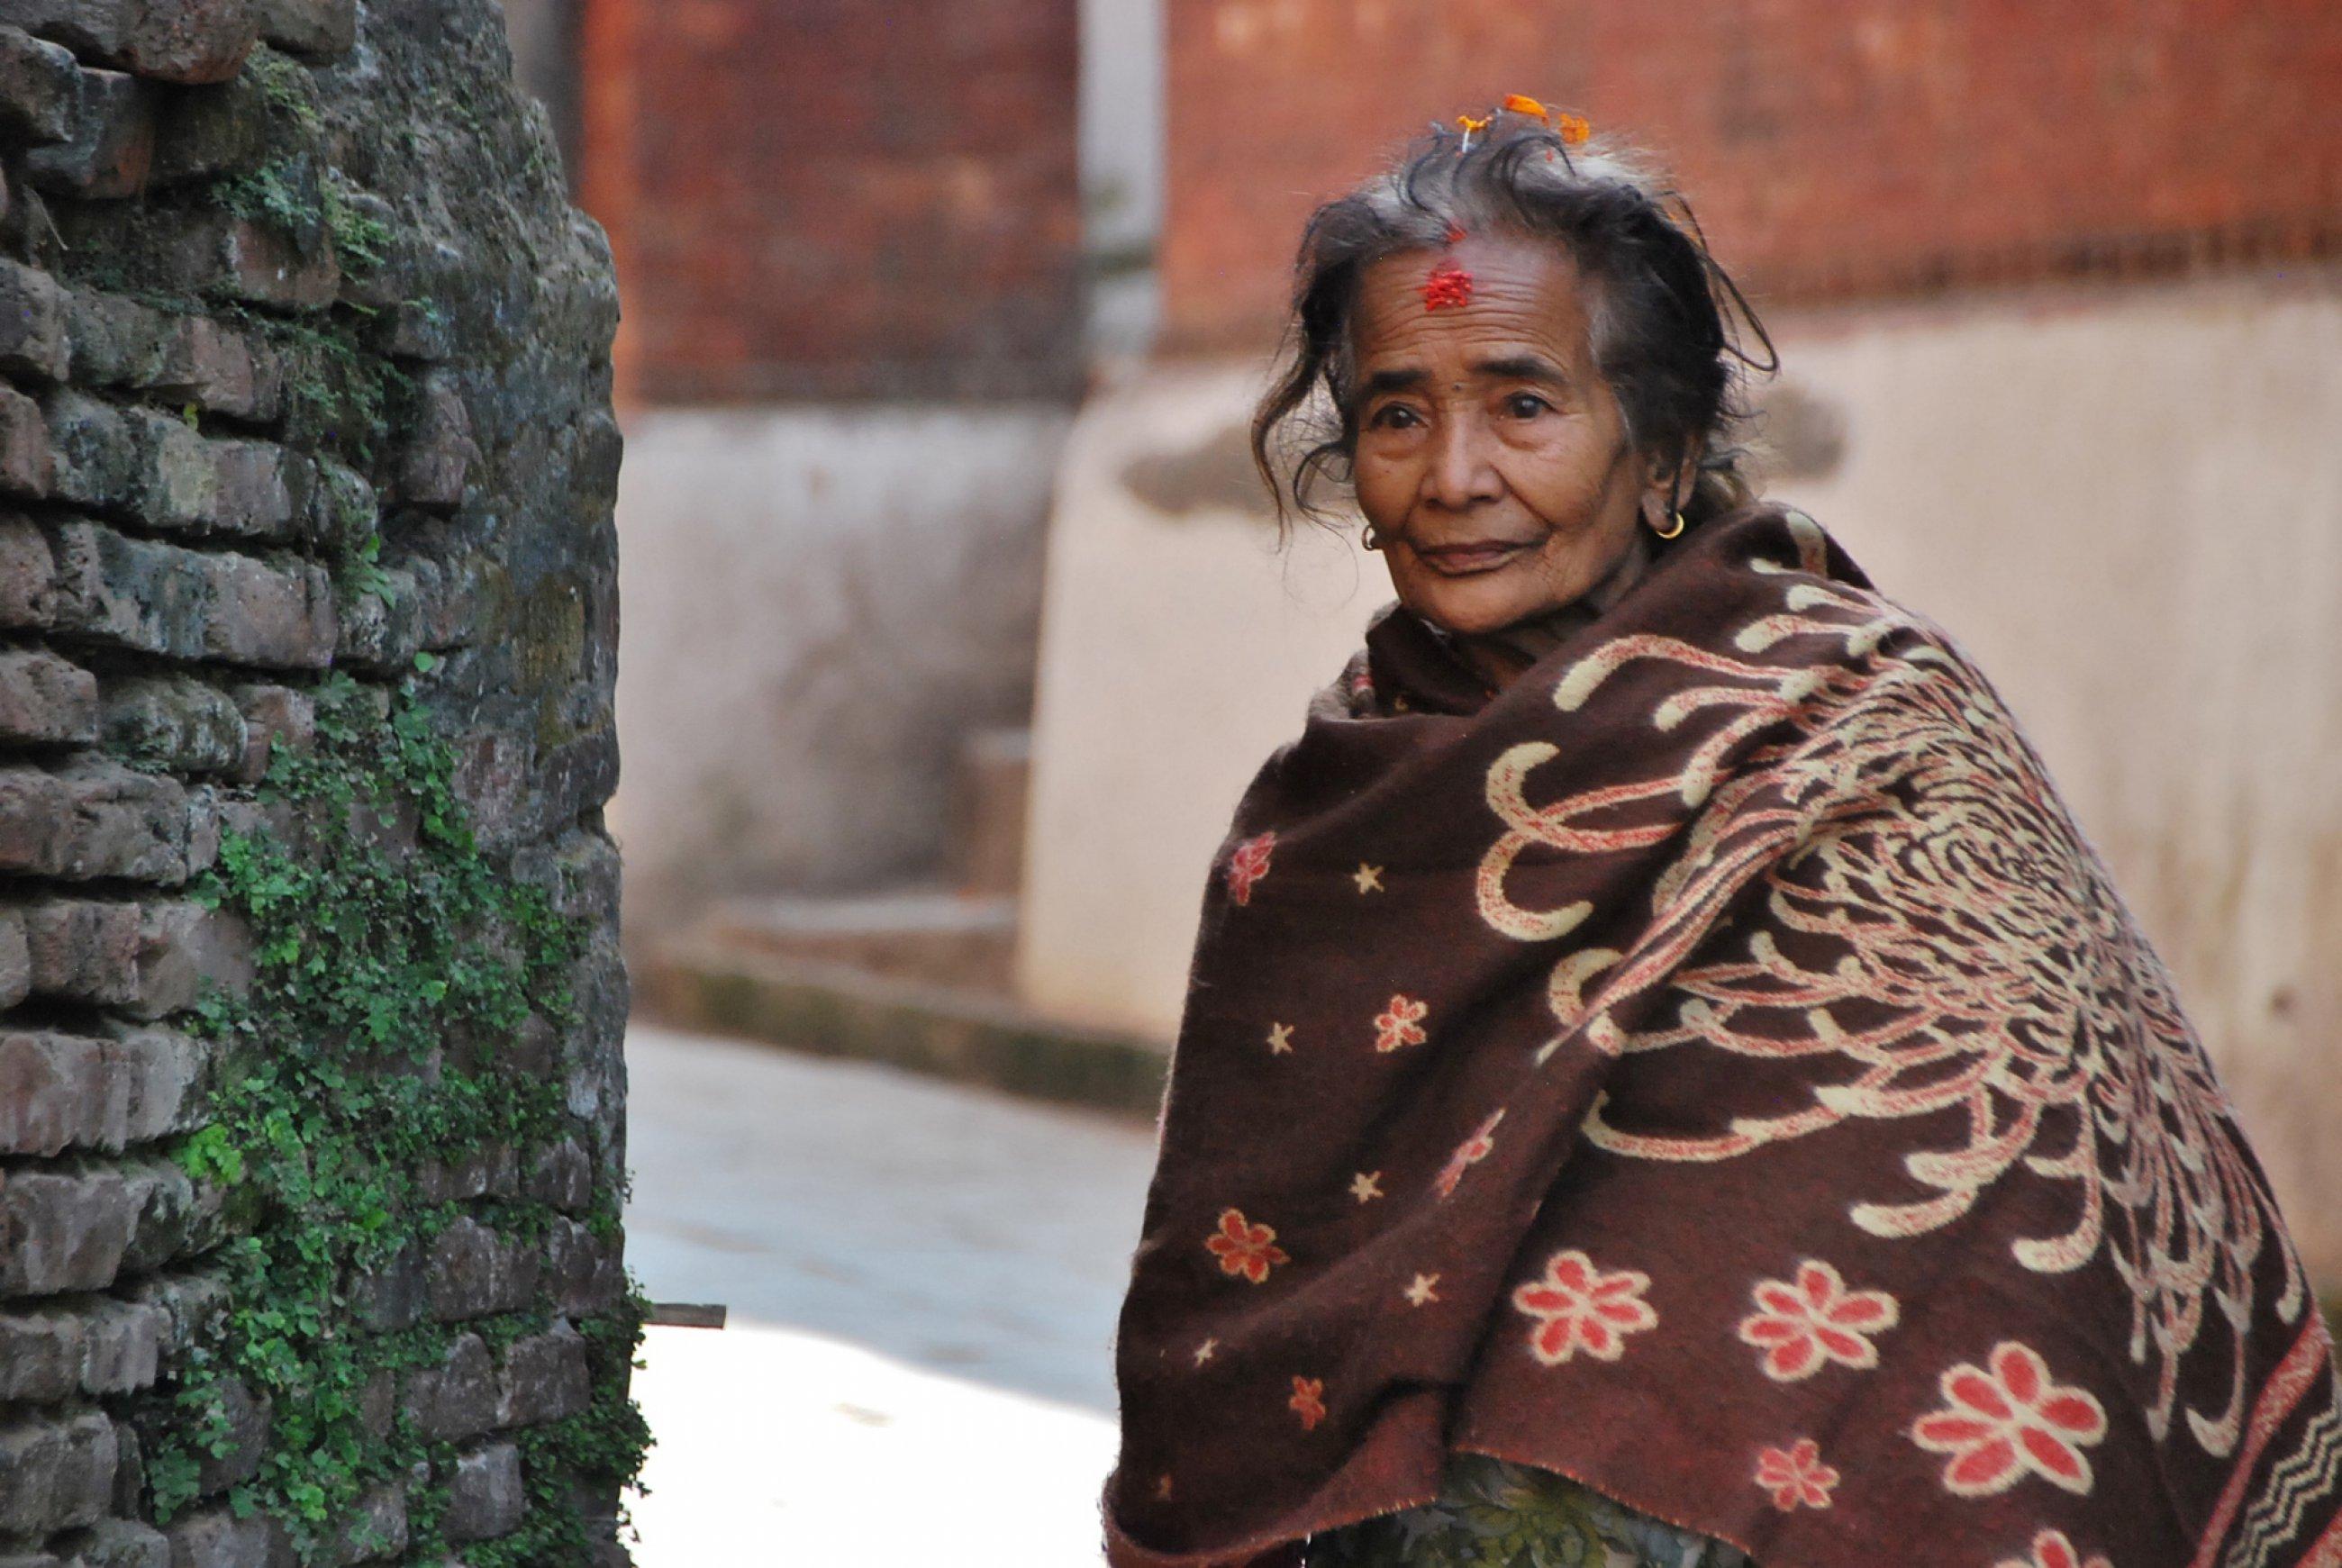 https://bubo.sk/uploads/galleries/16317/nepal-kathmandu-ctni-11-2014-mirka-sulka-425-.jpg